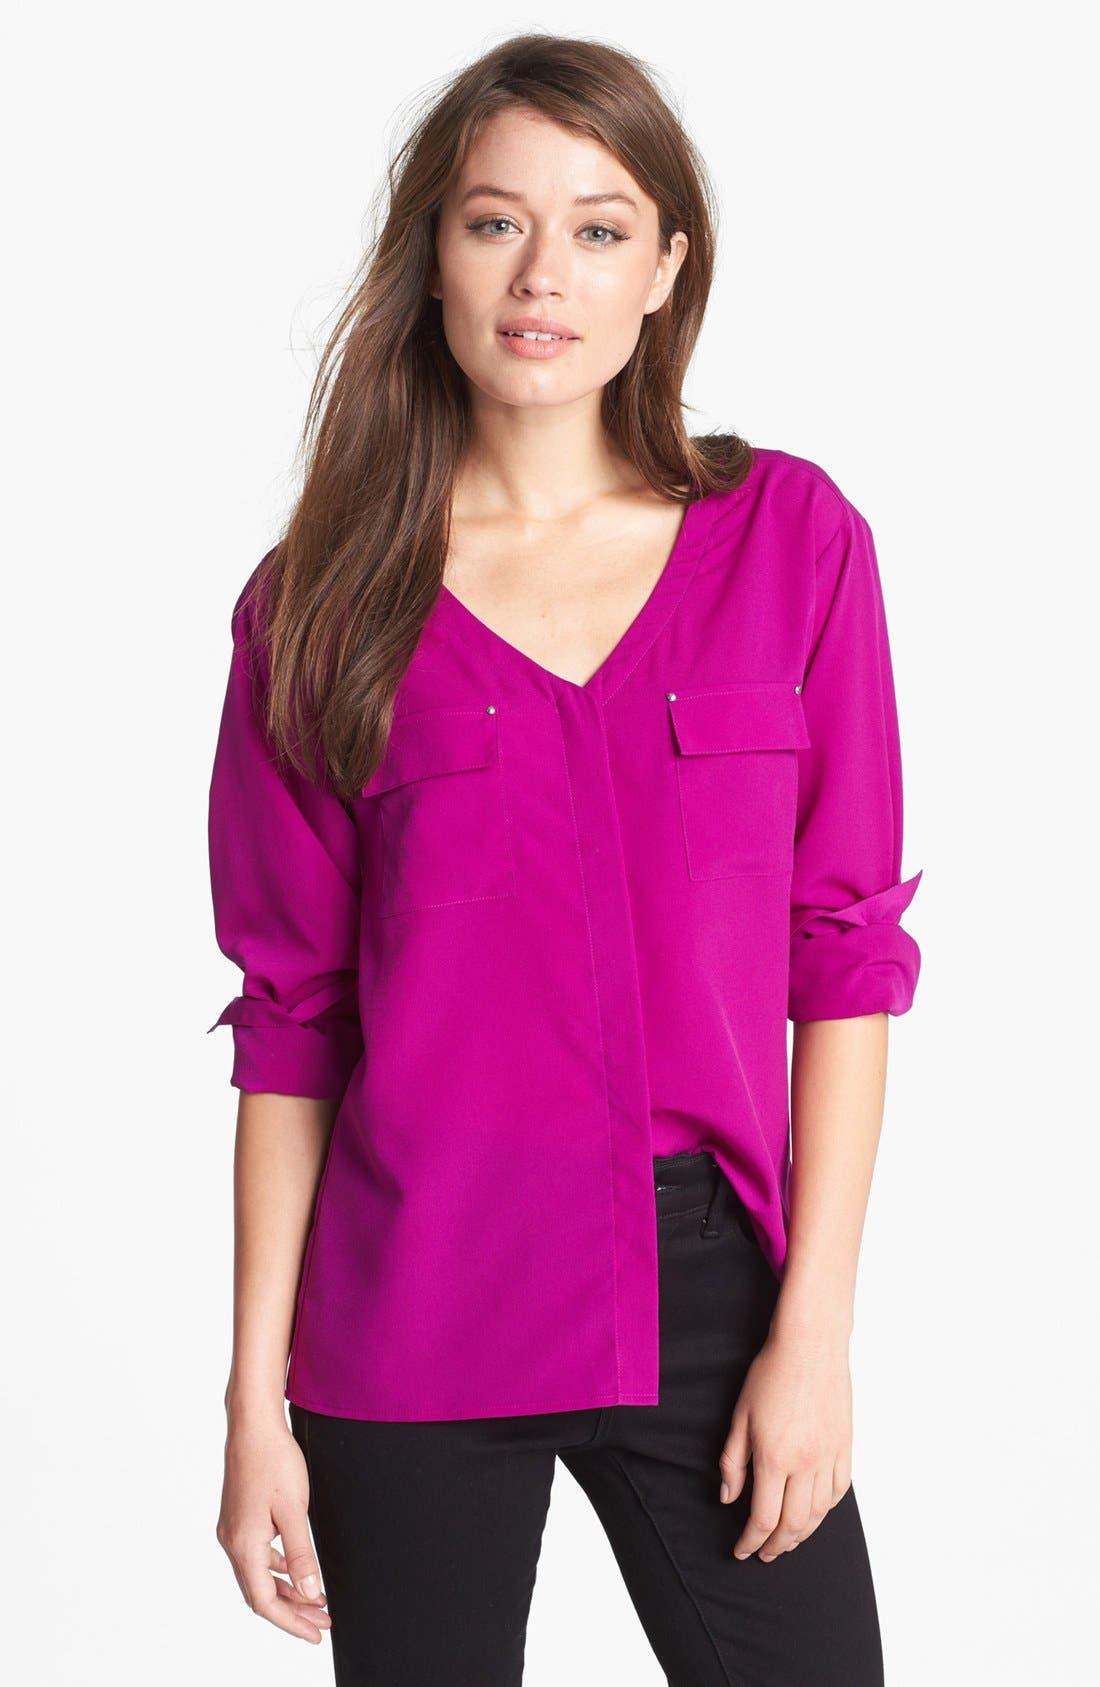 Alternate Image 1 Selected - Anne Klein V-Neck Shirt (Petite)